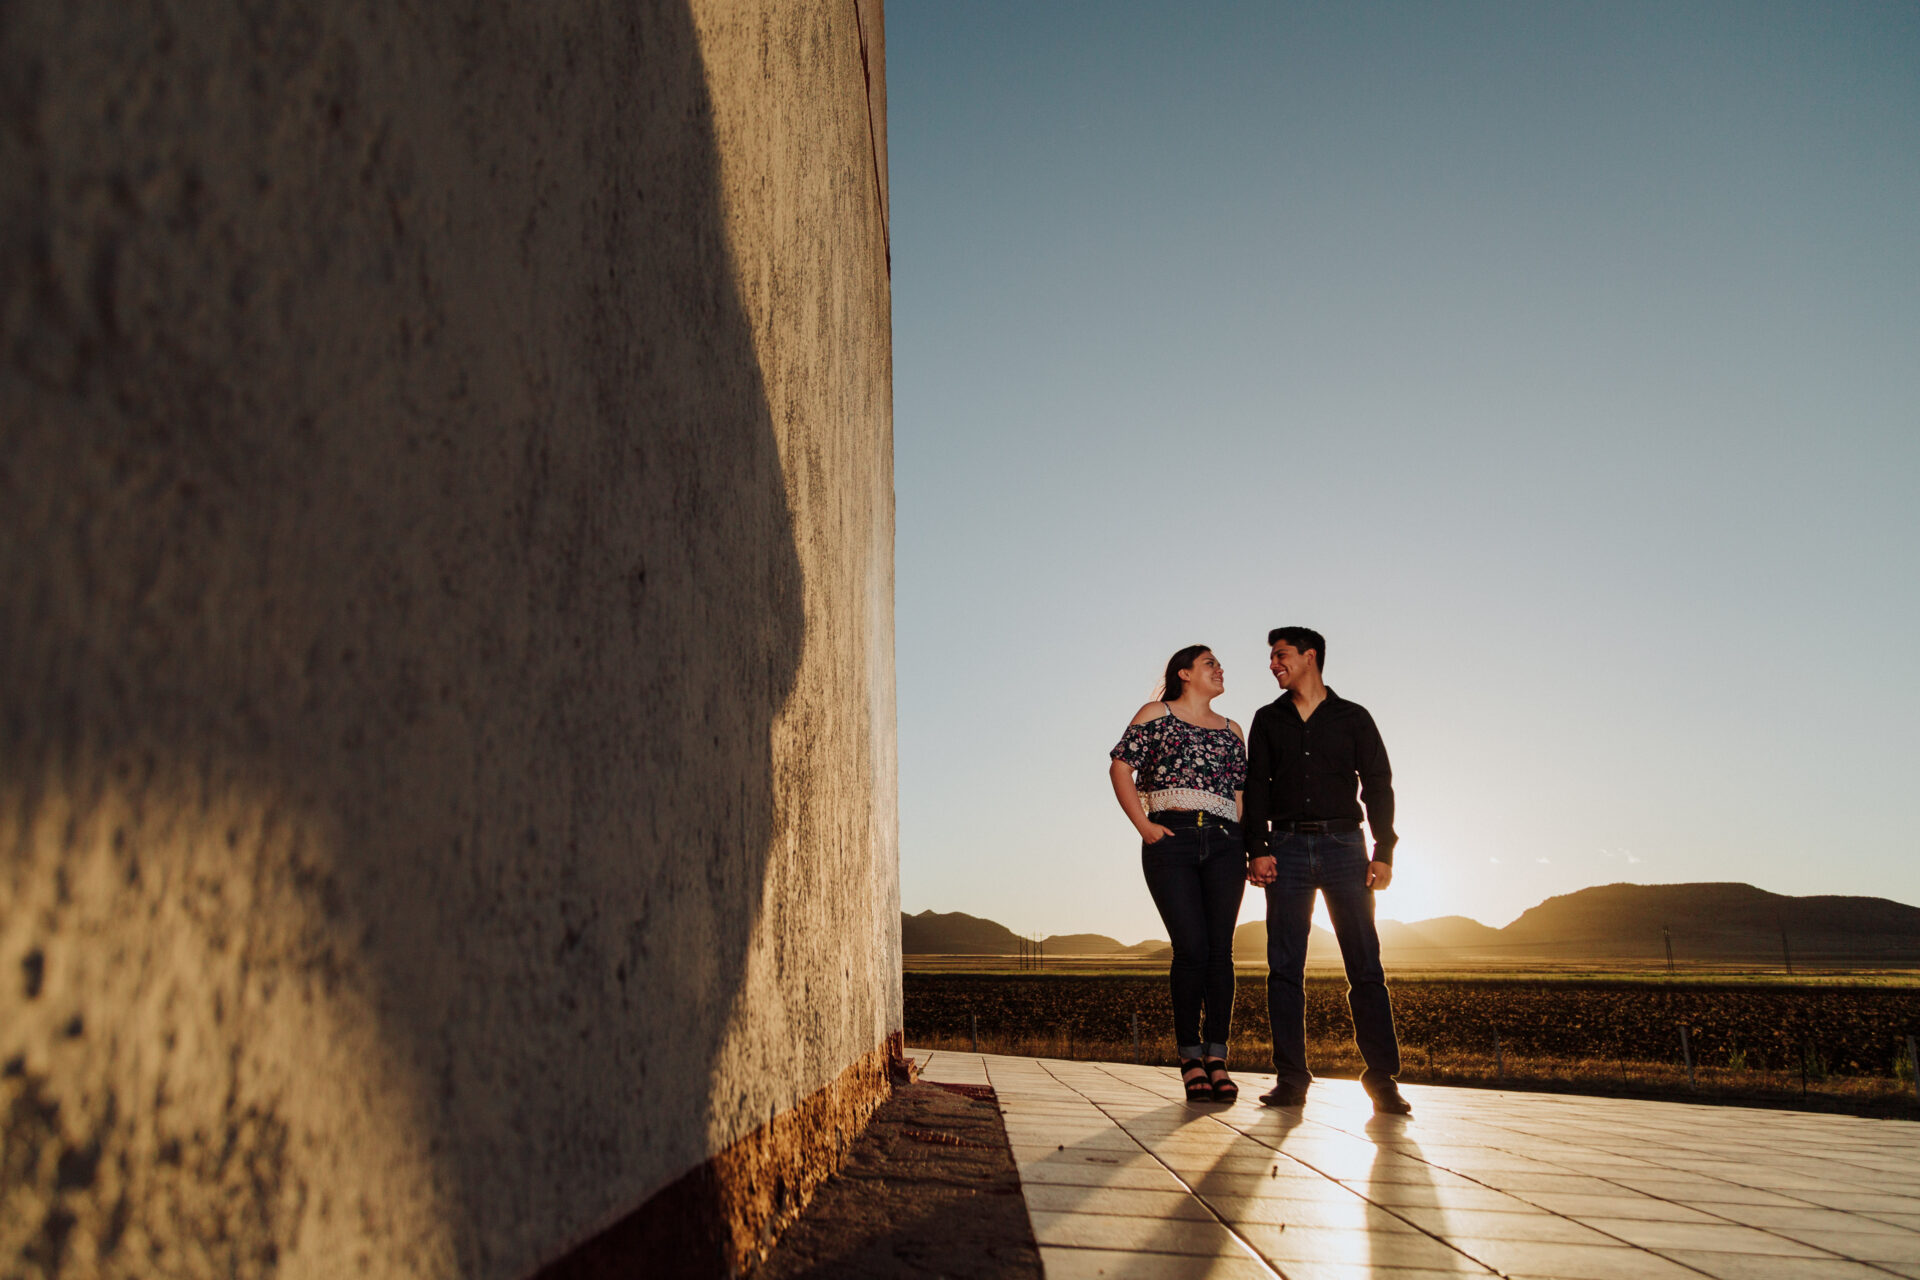 javier_noriega_fotografo_bodas_zacatecas_chihuahua_wedding_photographer12